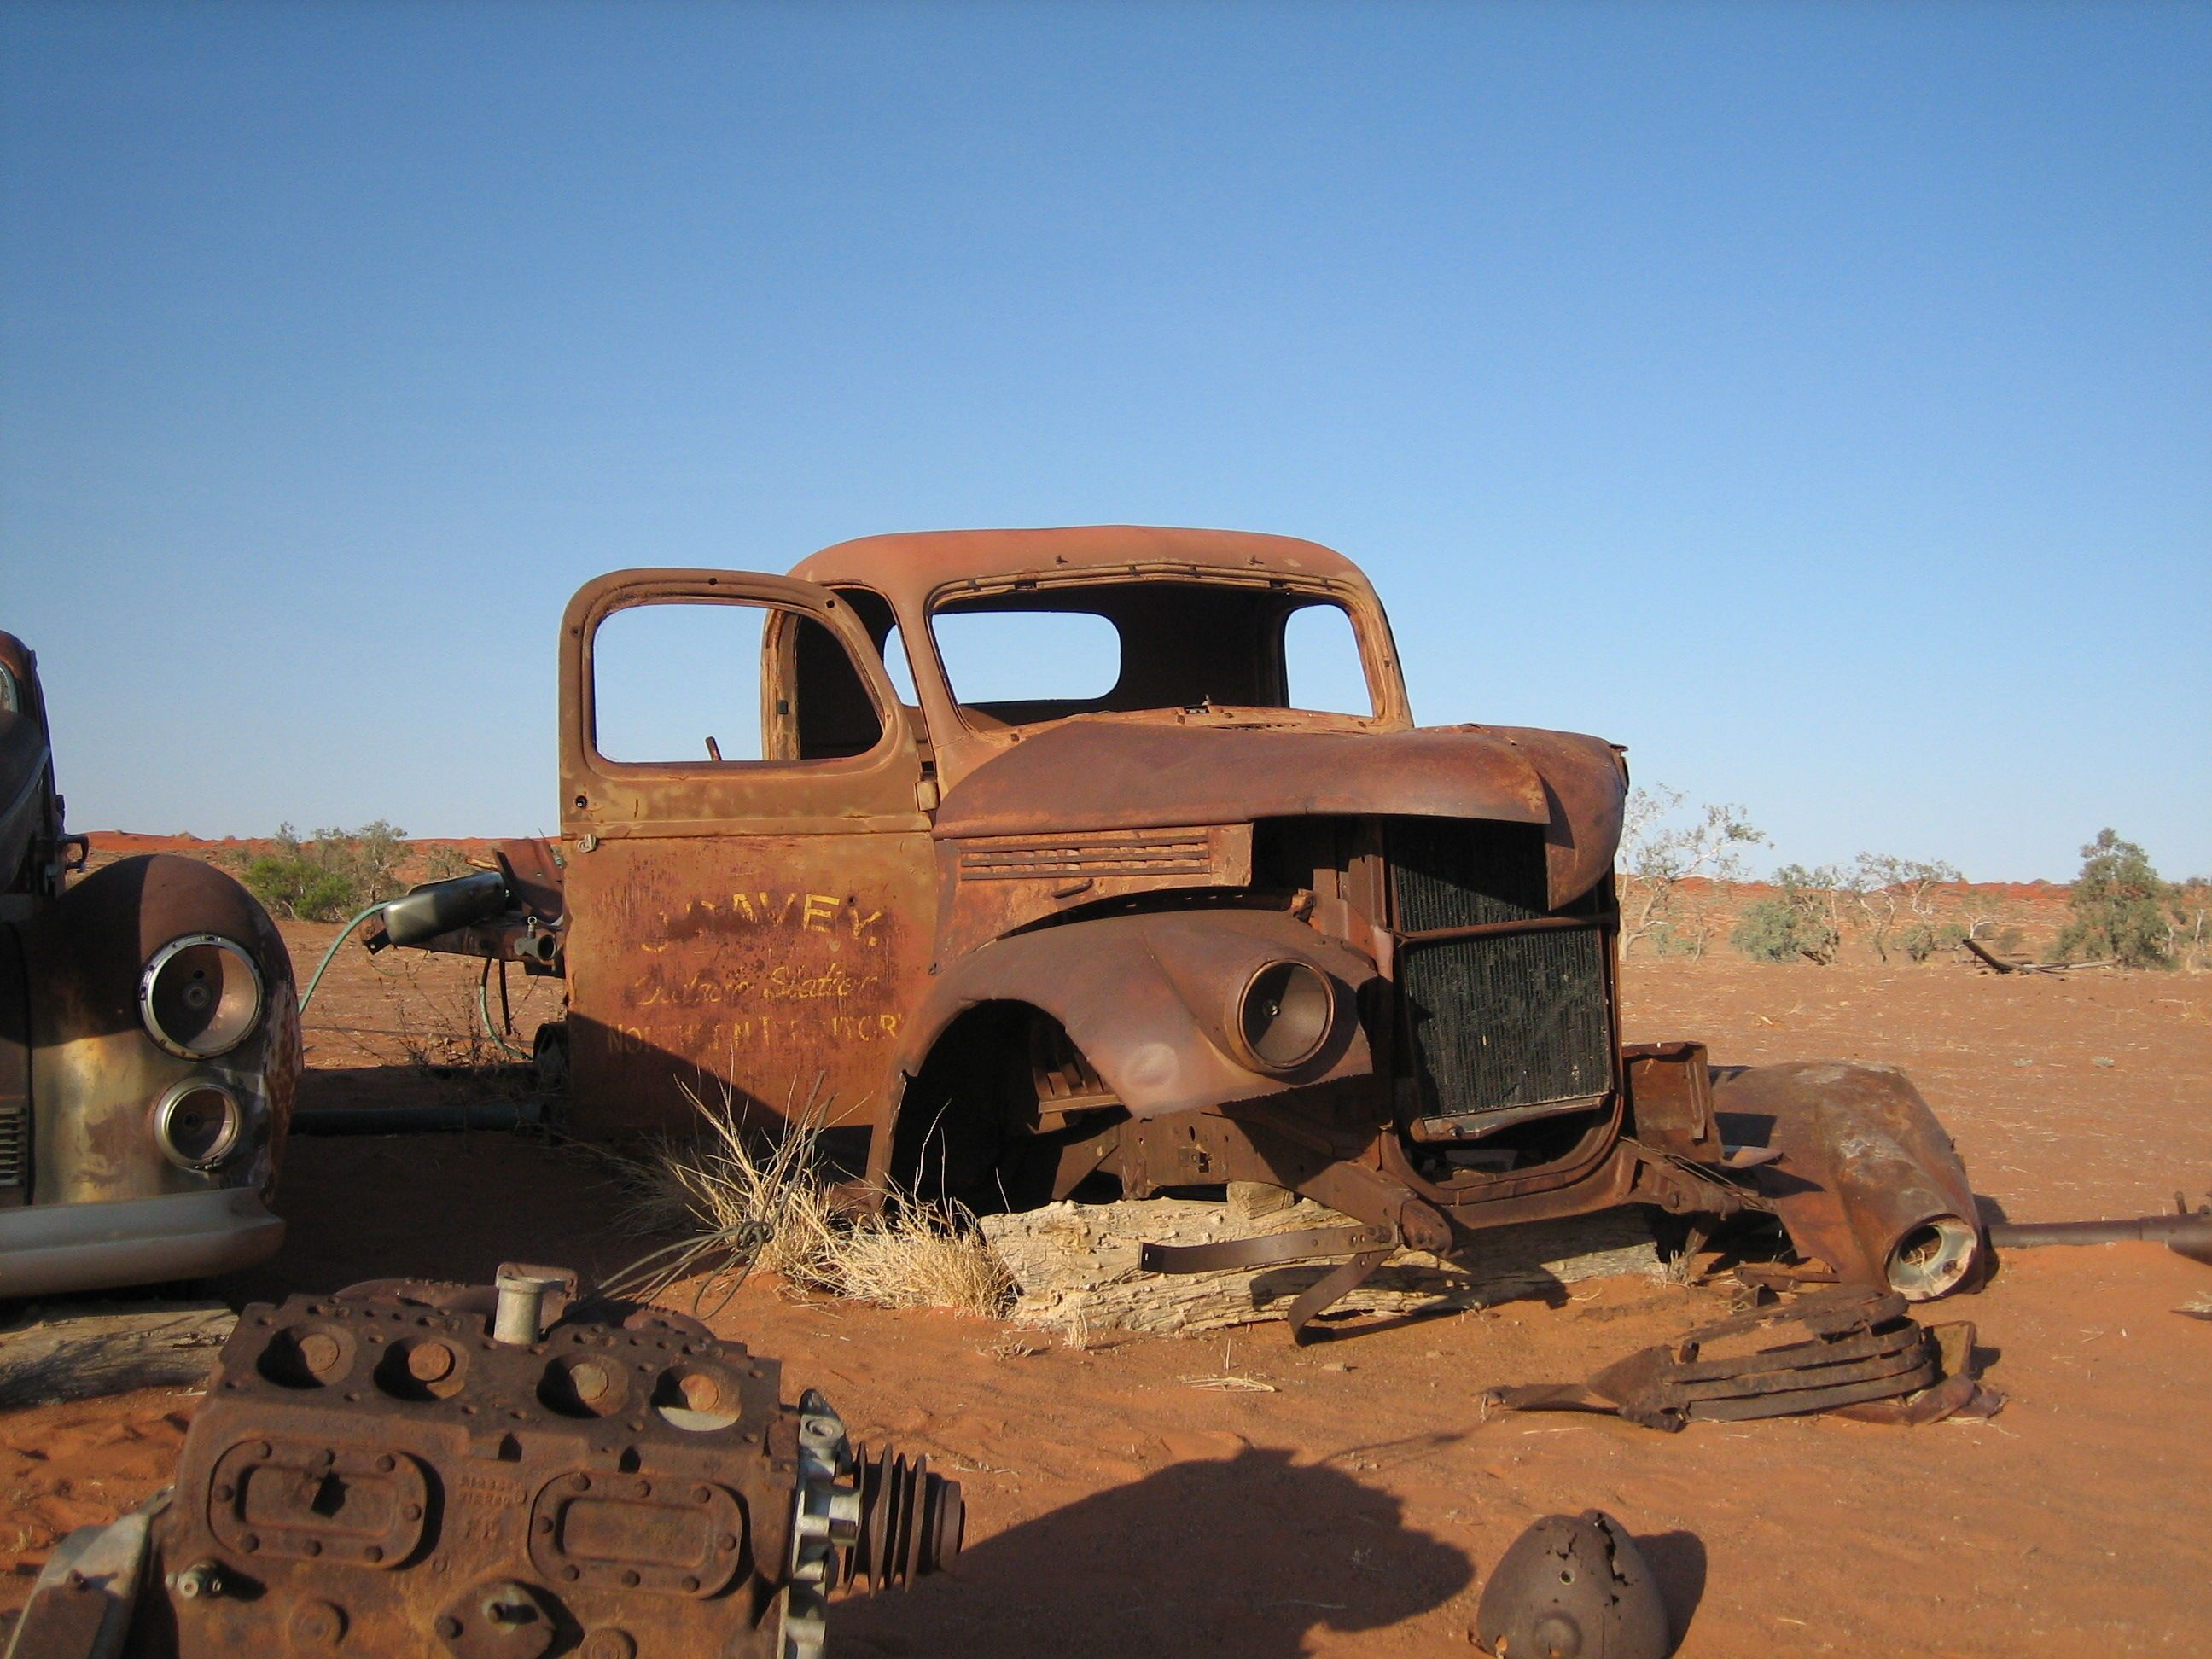 Old Truck At Old Anadado Northern Territory Seeaustralia